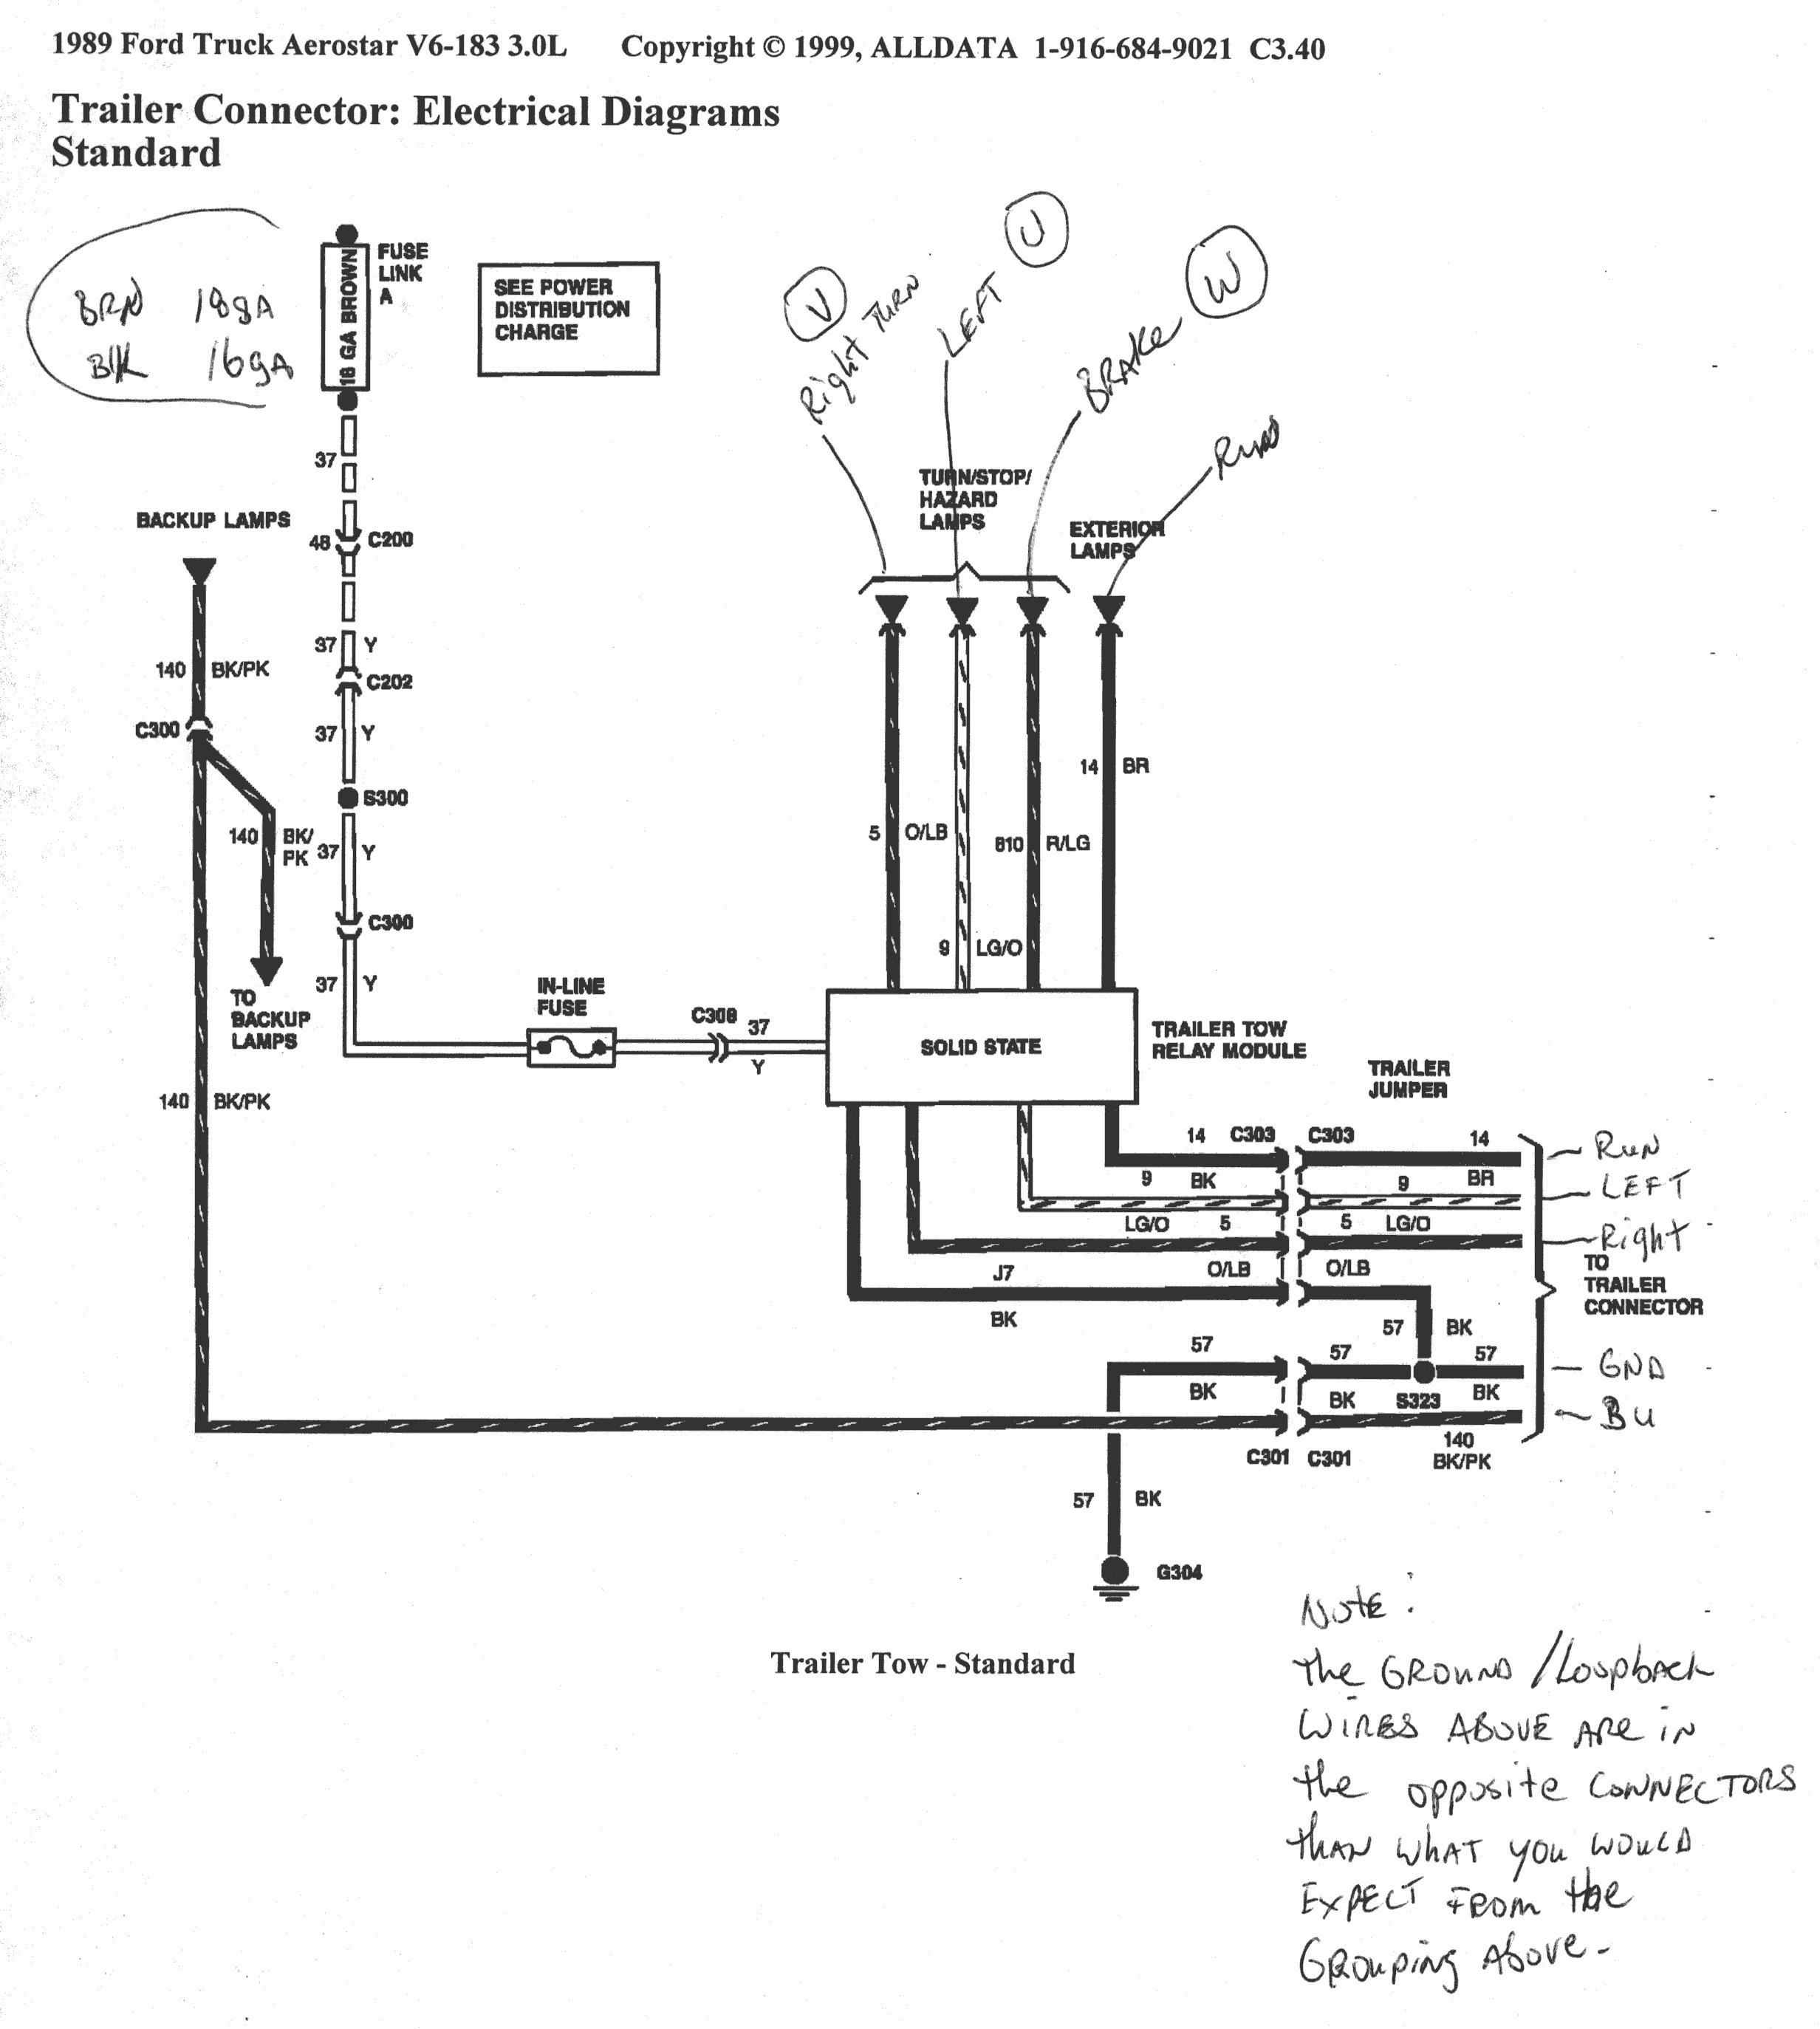 1991 toyota Pickup Tail Light Wiring Diagram Tail Light Wiring Diagram Chevy Unique Tail Light Wiring Diagram Of 1991 toyota Pickup Tail Light Wiring Diagram